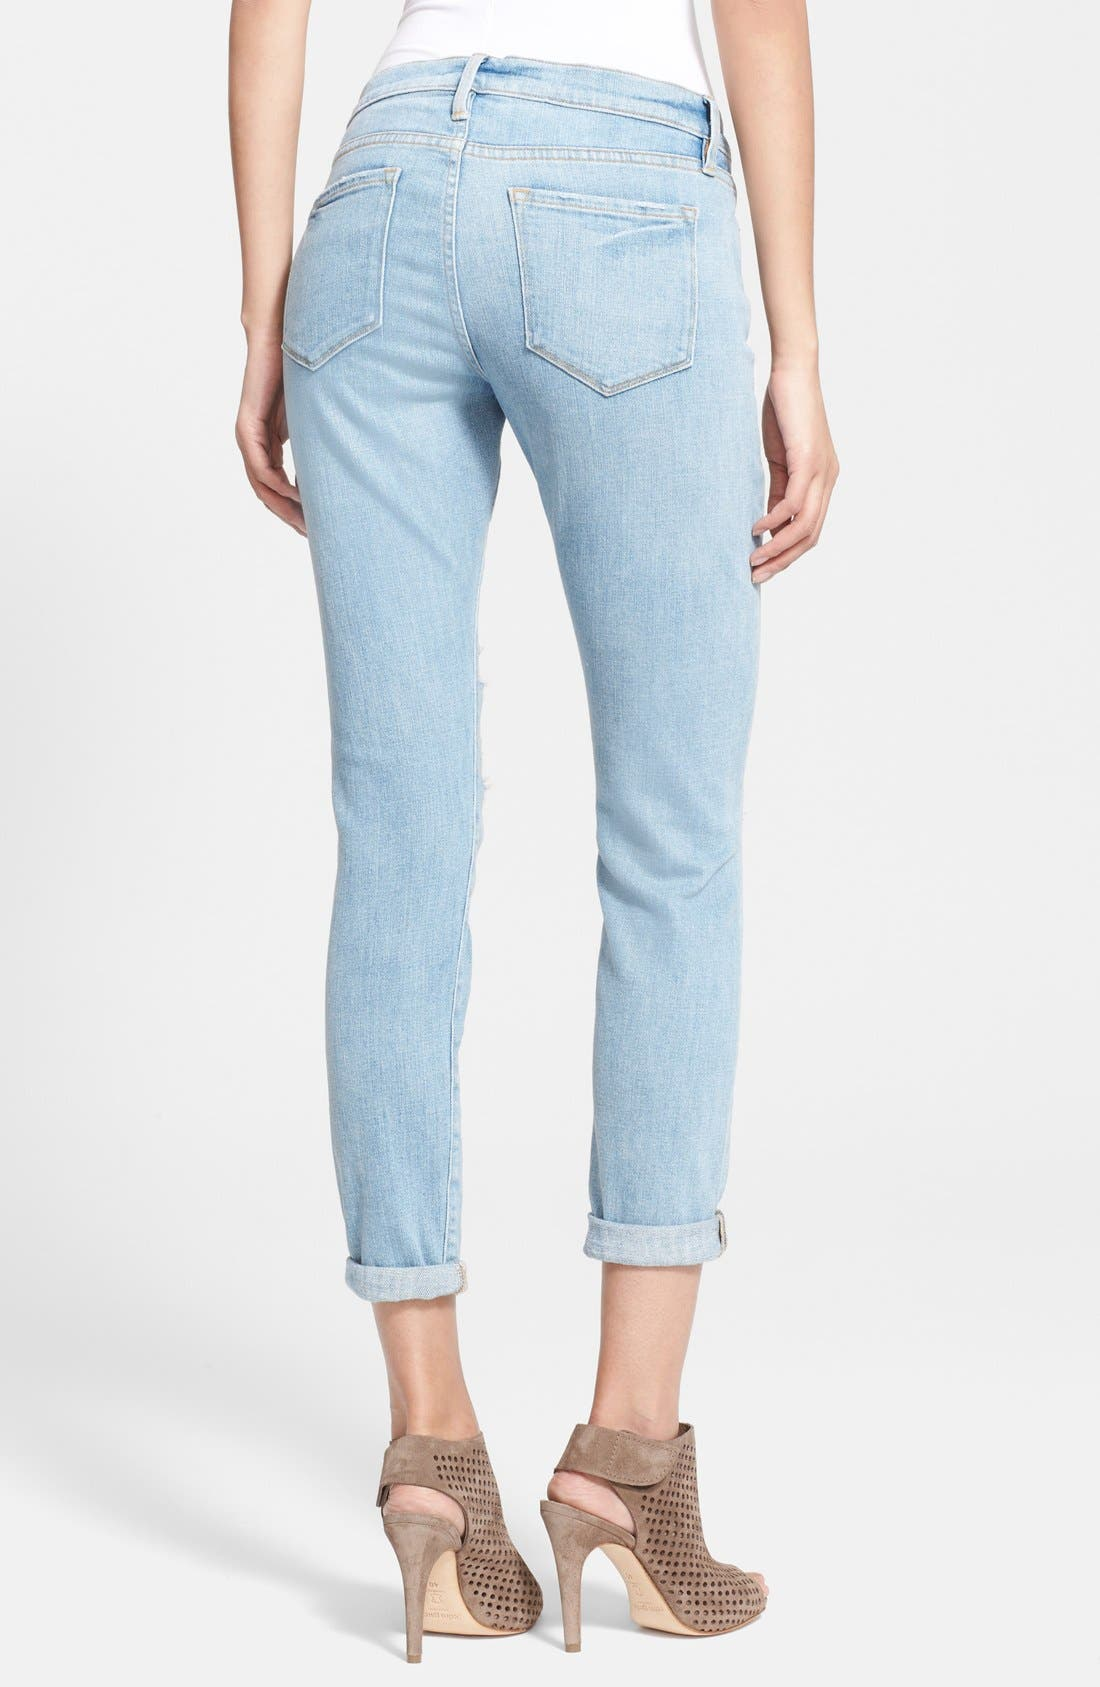 Alternate Image 2  - Frame Denim 'Le Garcon' Boyfriend Jeans (Lucielle)